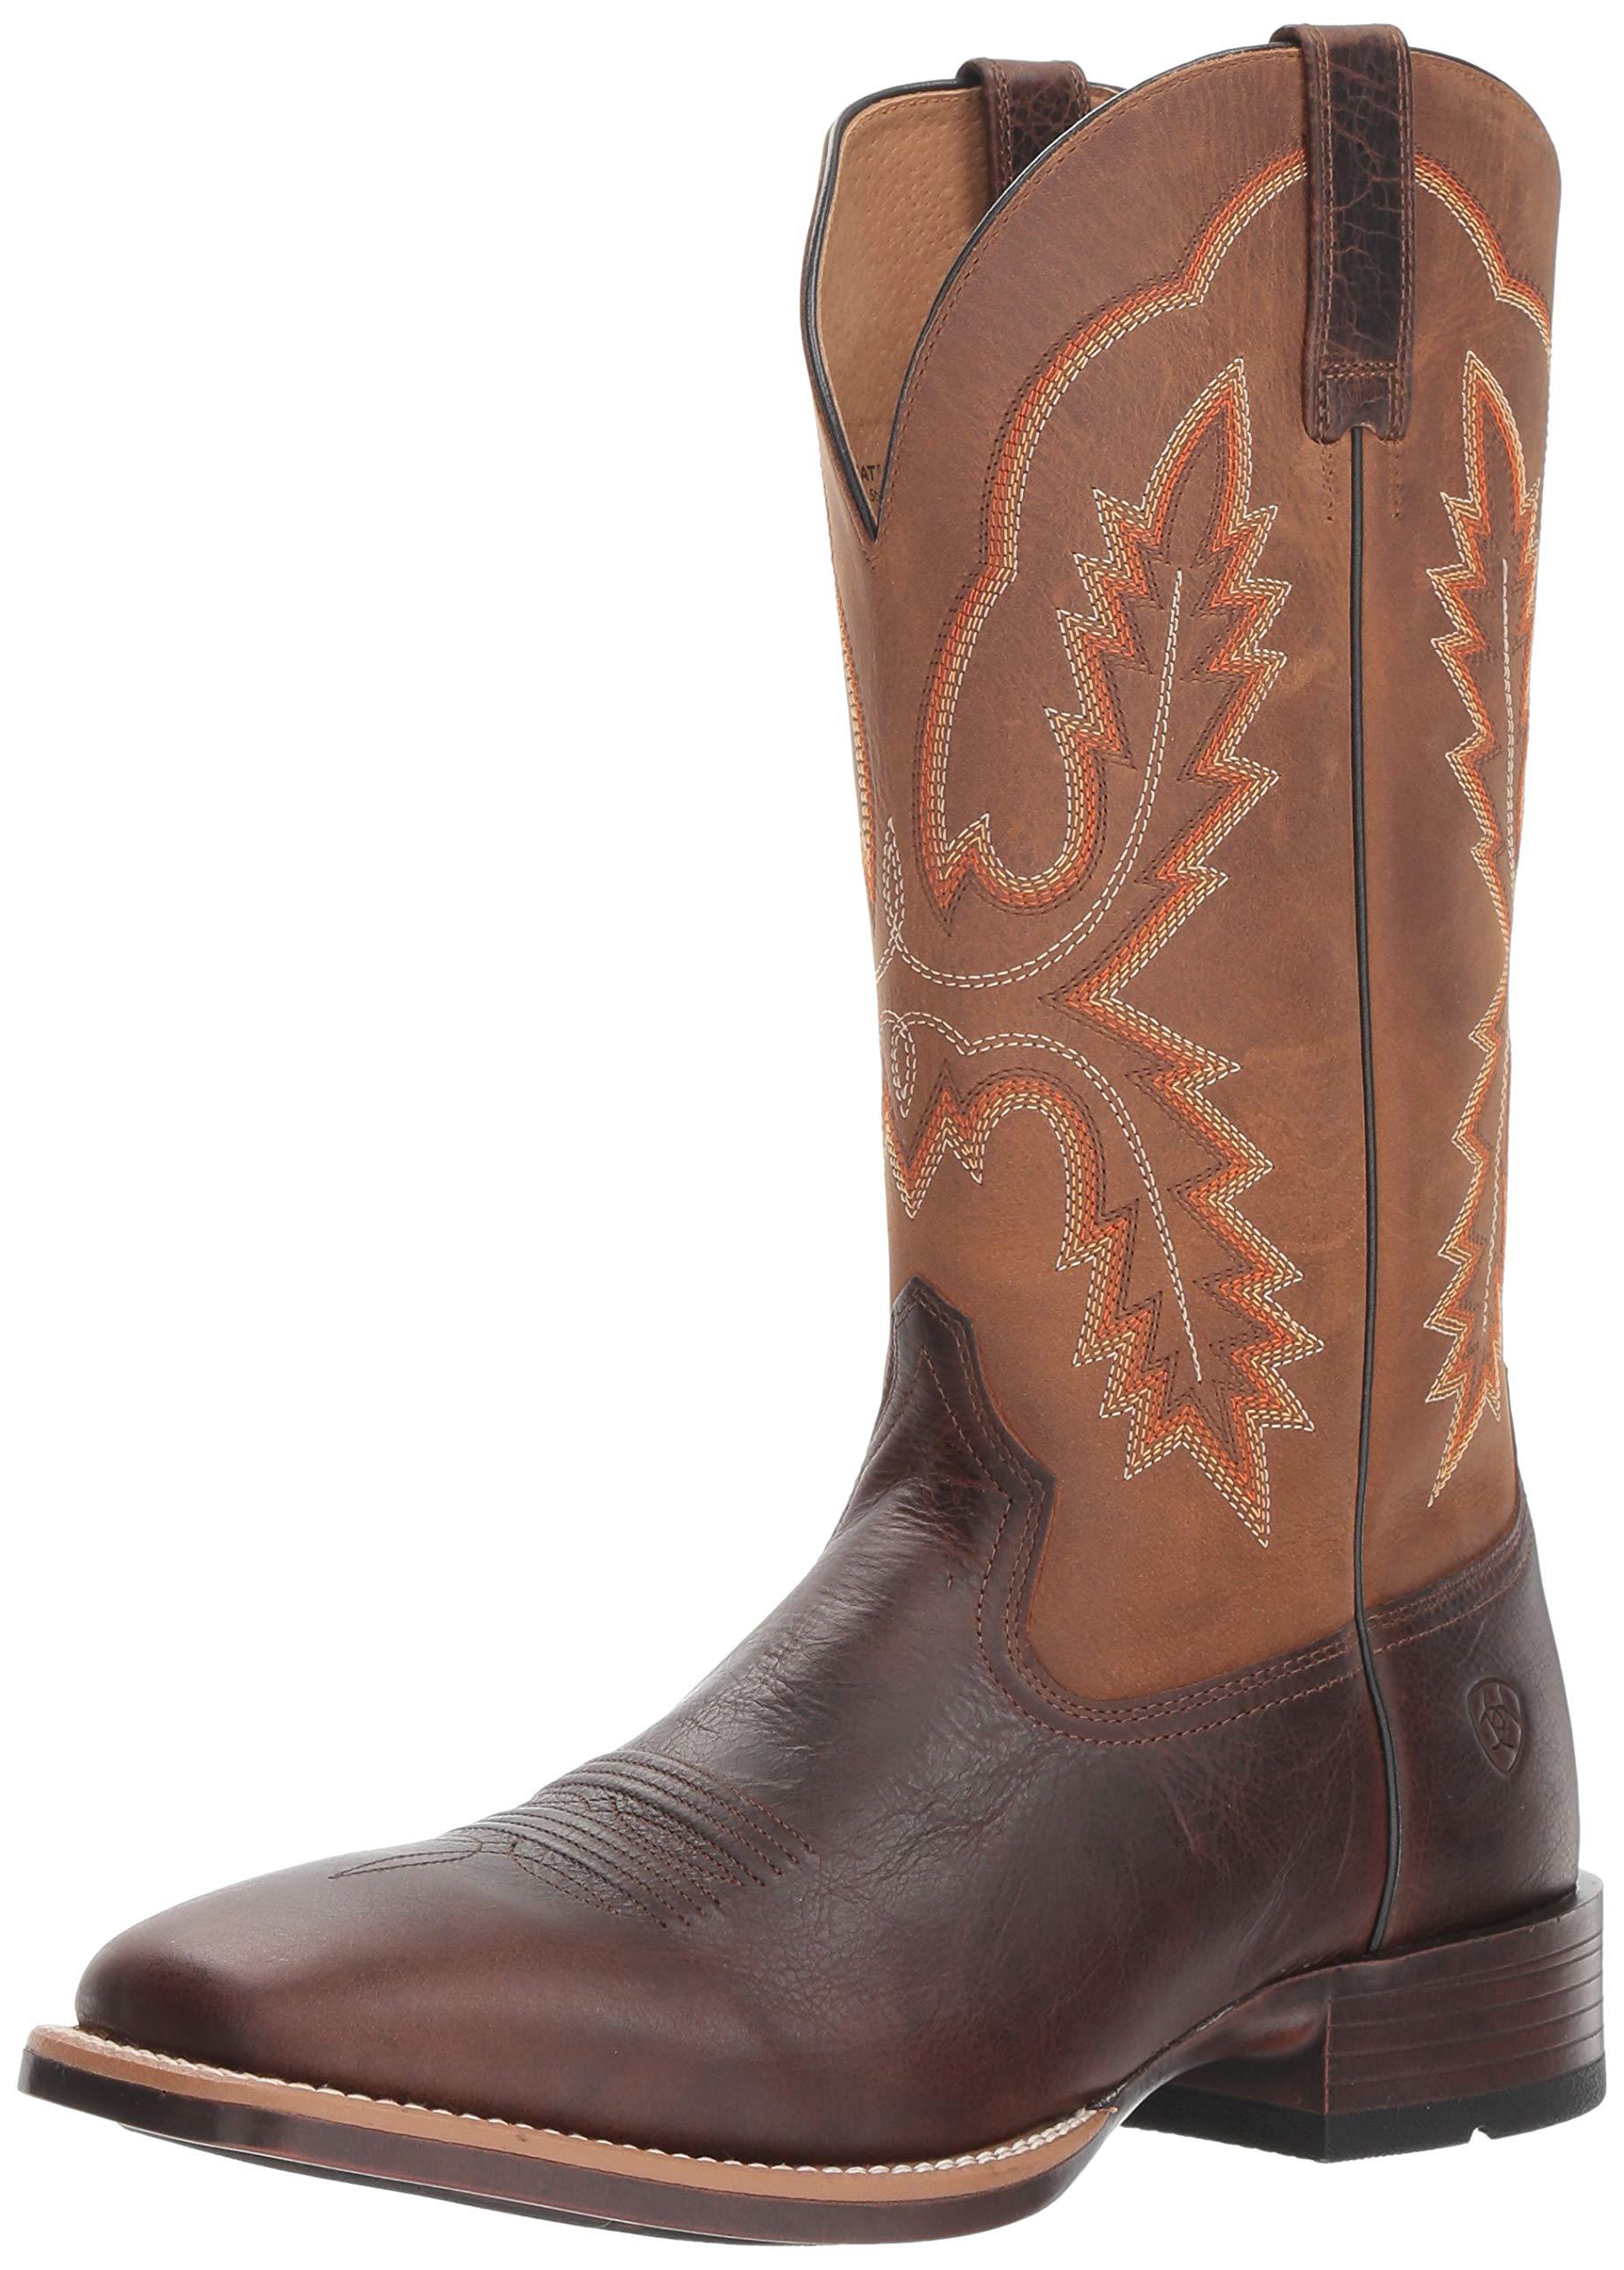 Ariat Men's PECOS Western Boot, Wicker, 13 2E US by ARIAT